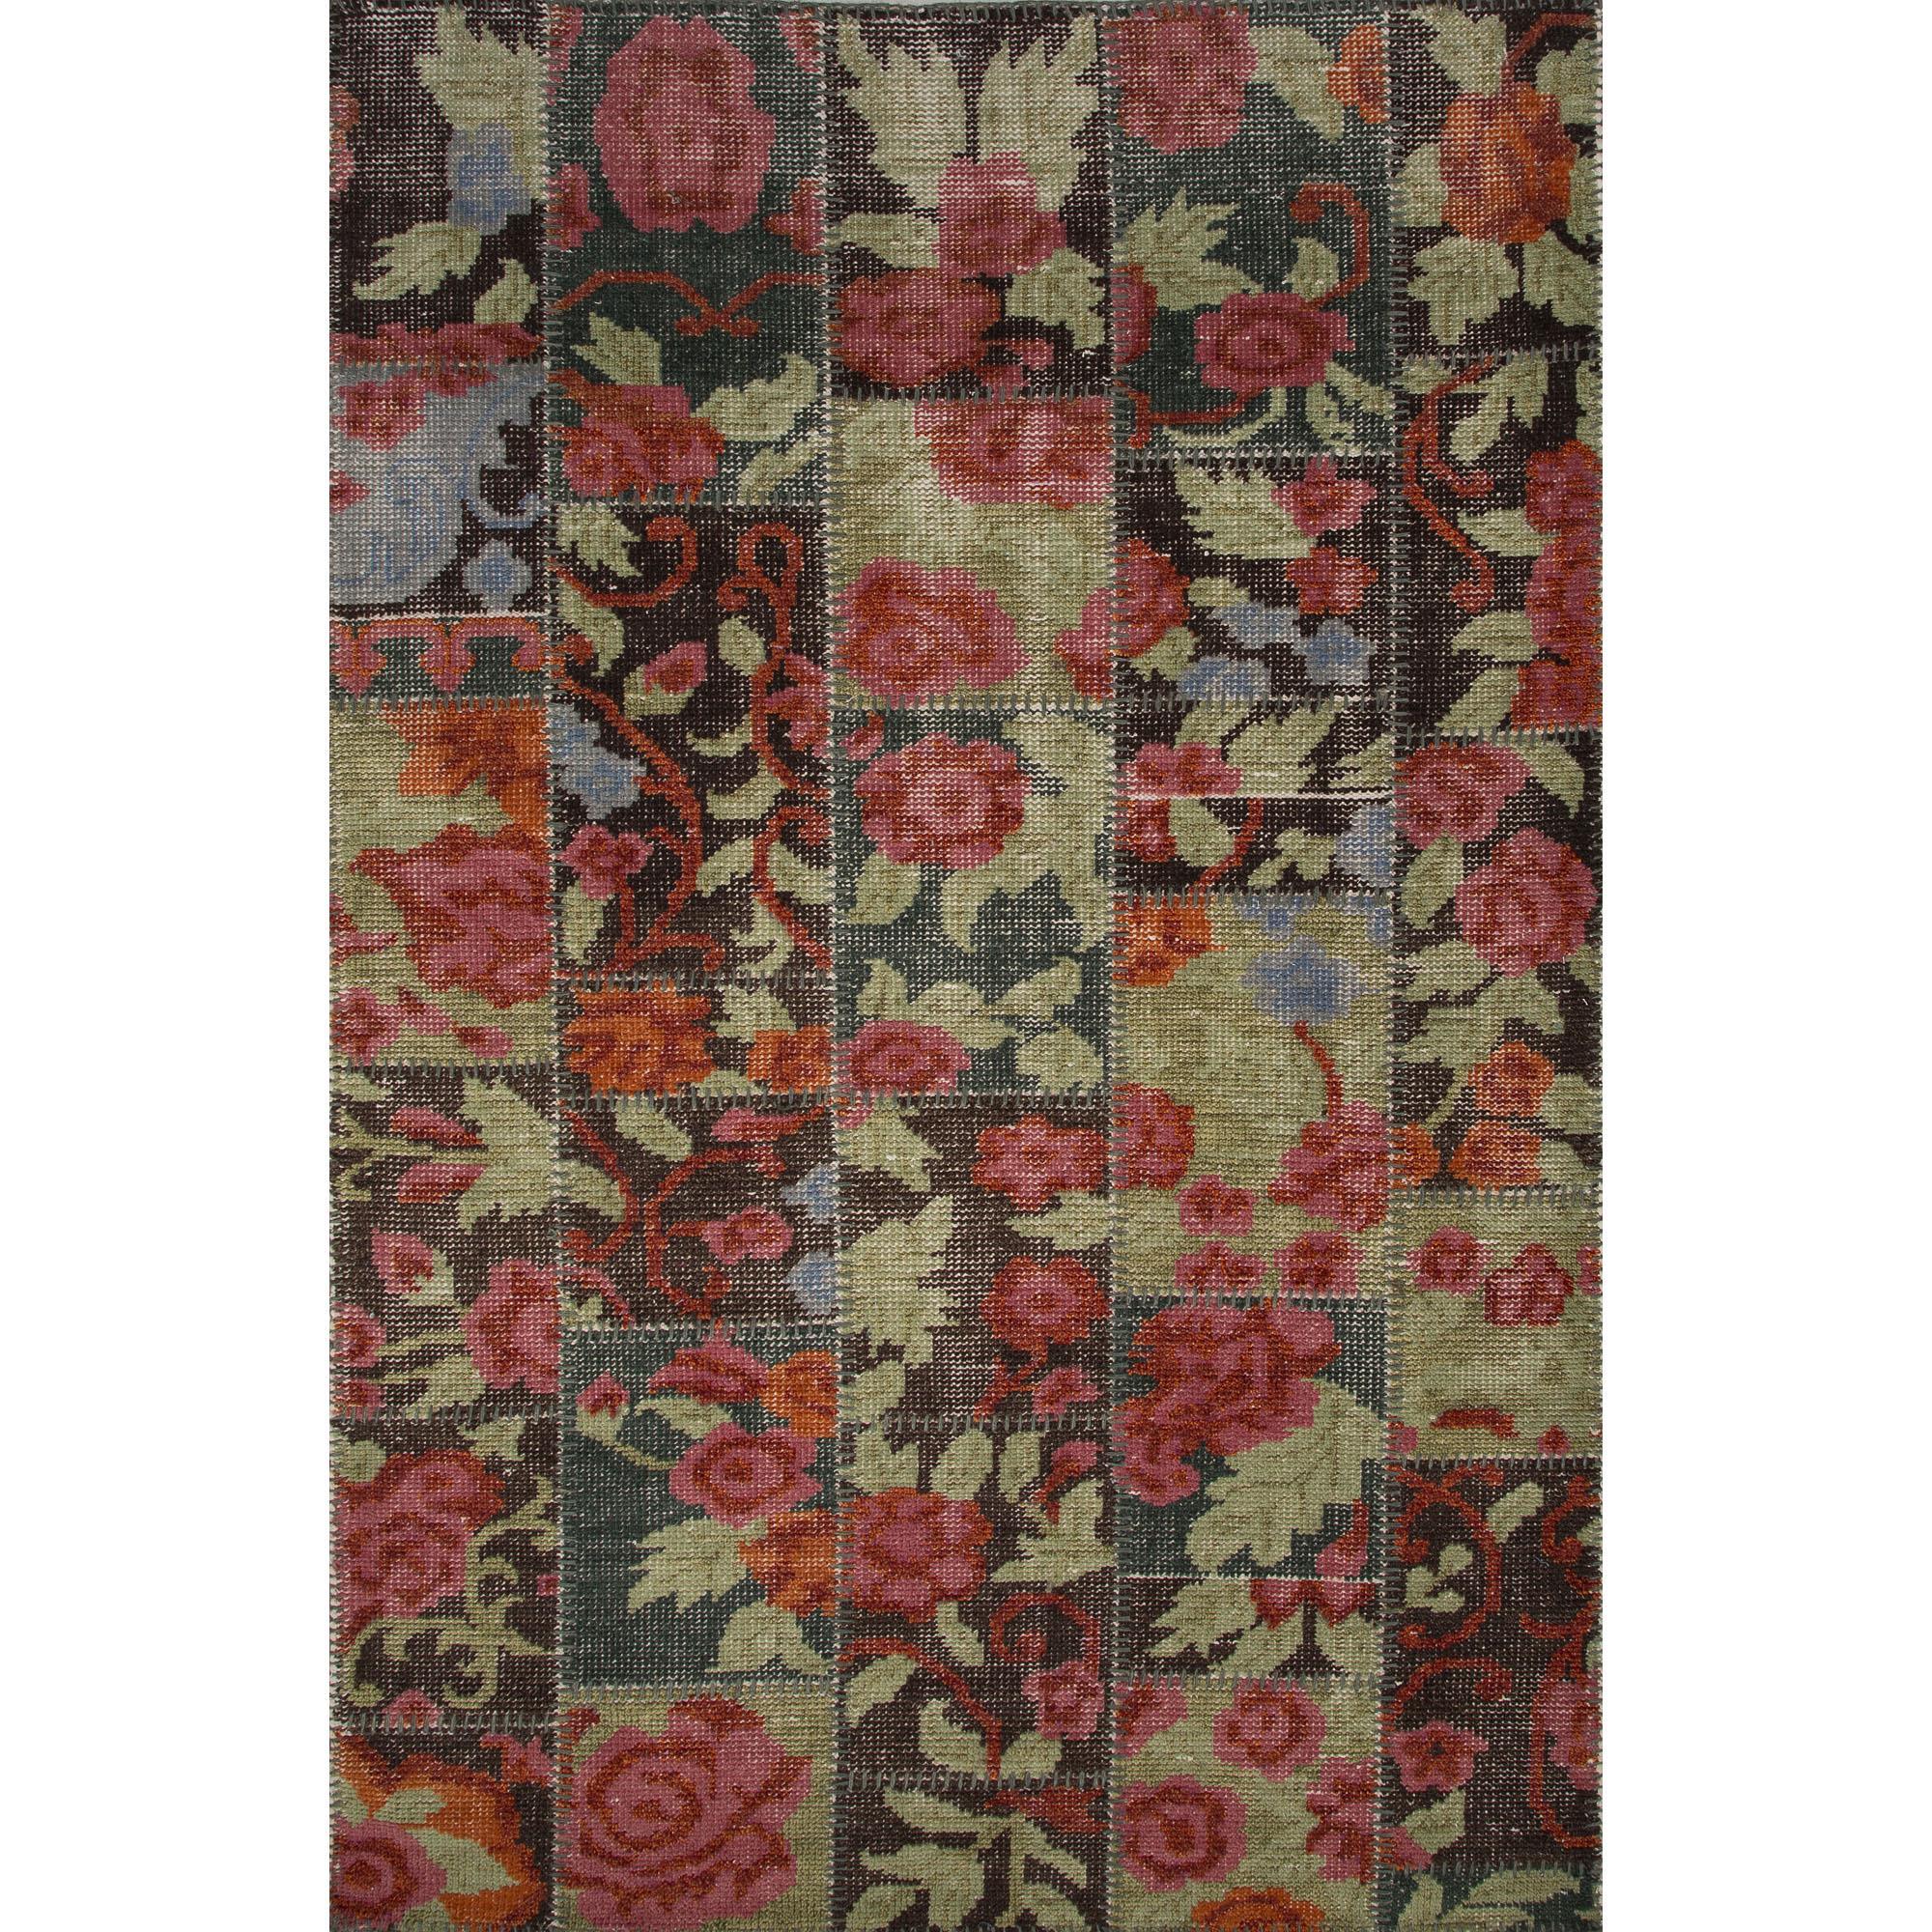 JAIPUR Rugs Cheshire By Rug Republic 5 x 8 Rug - Item Number: RUG123120